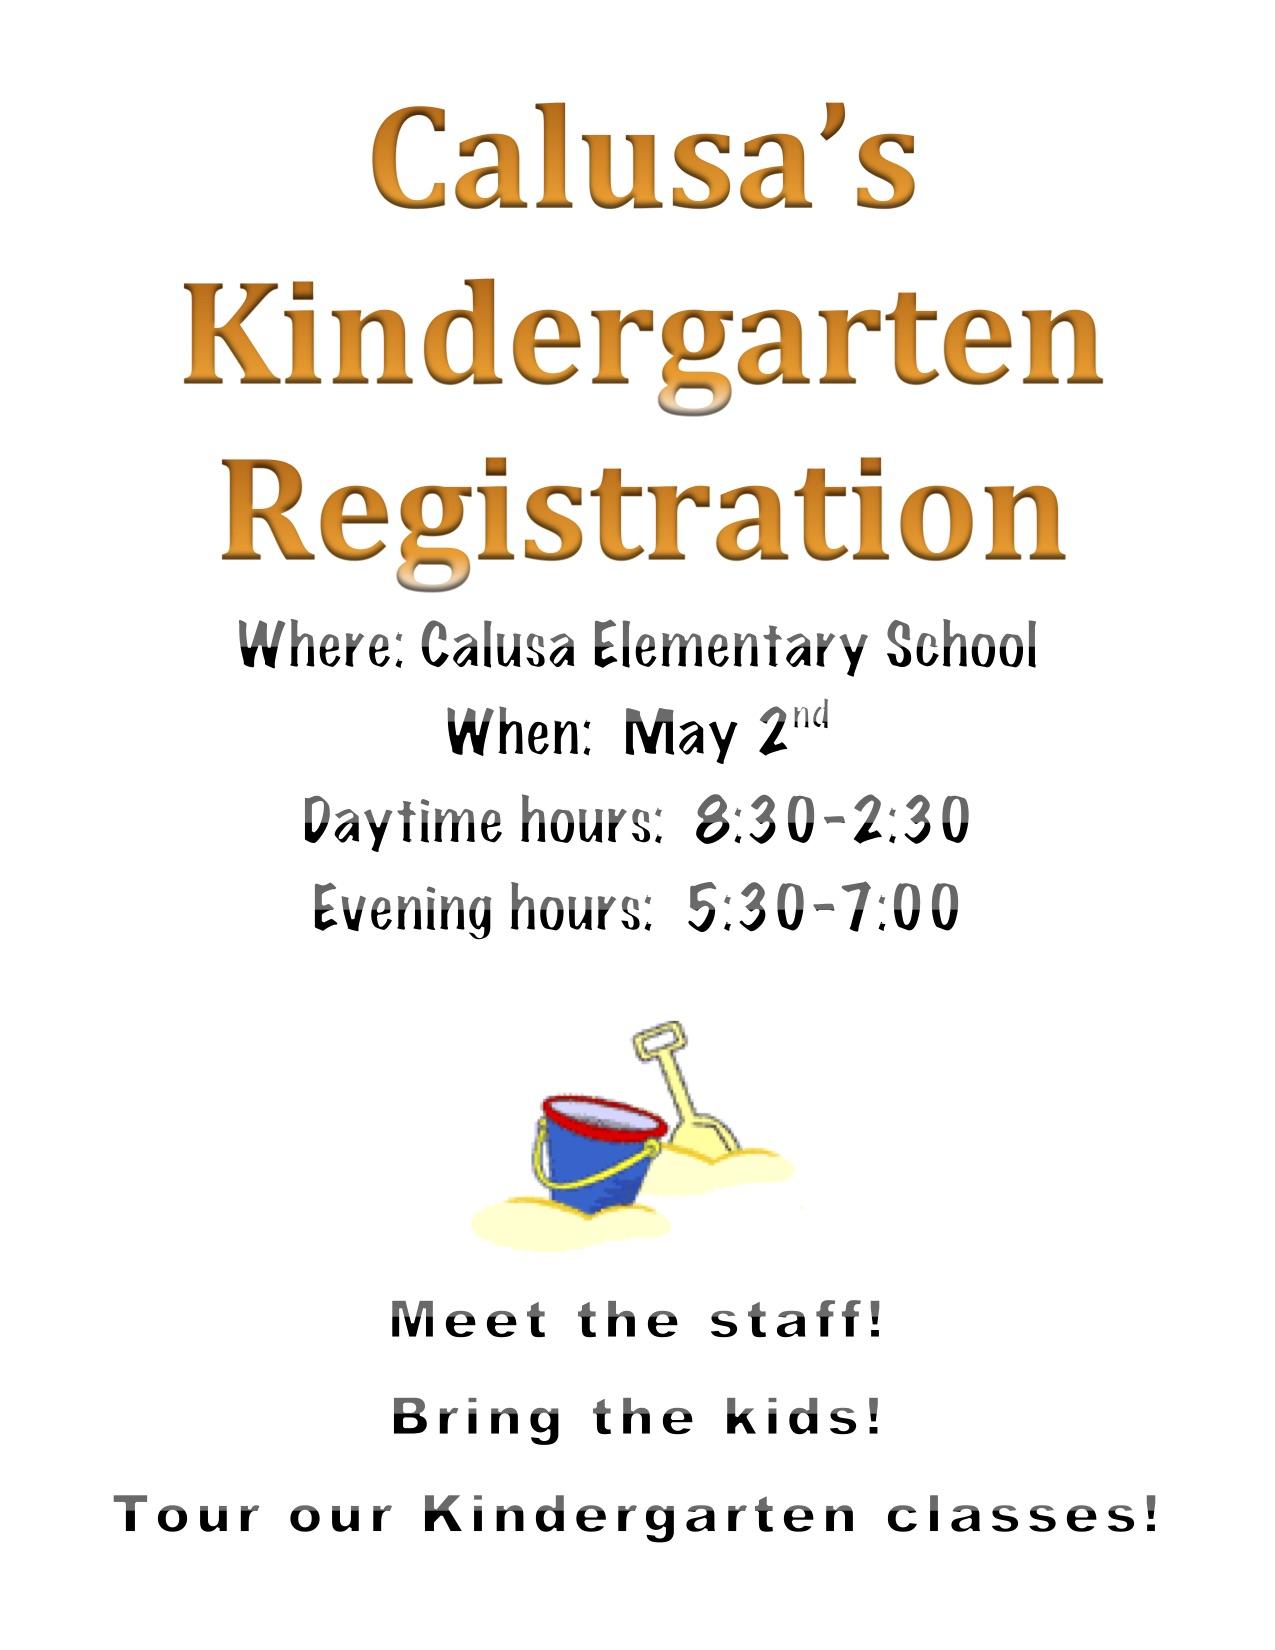 Calusa Kindergarten Registration